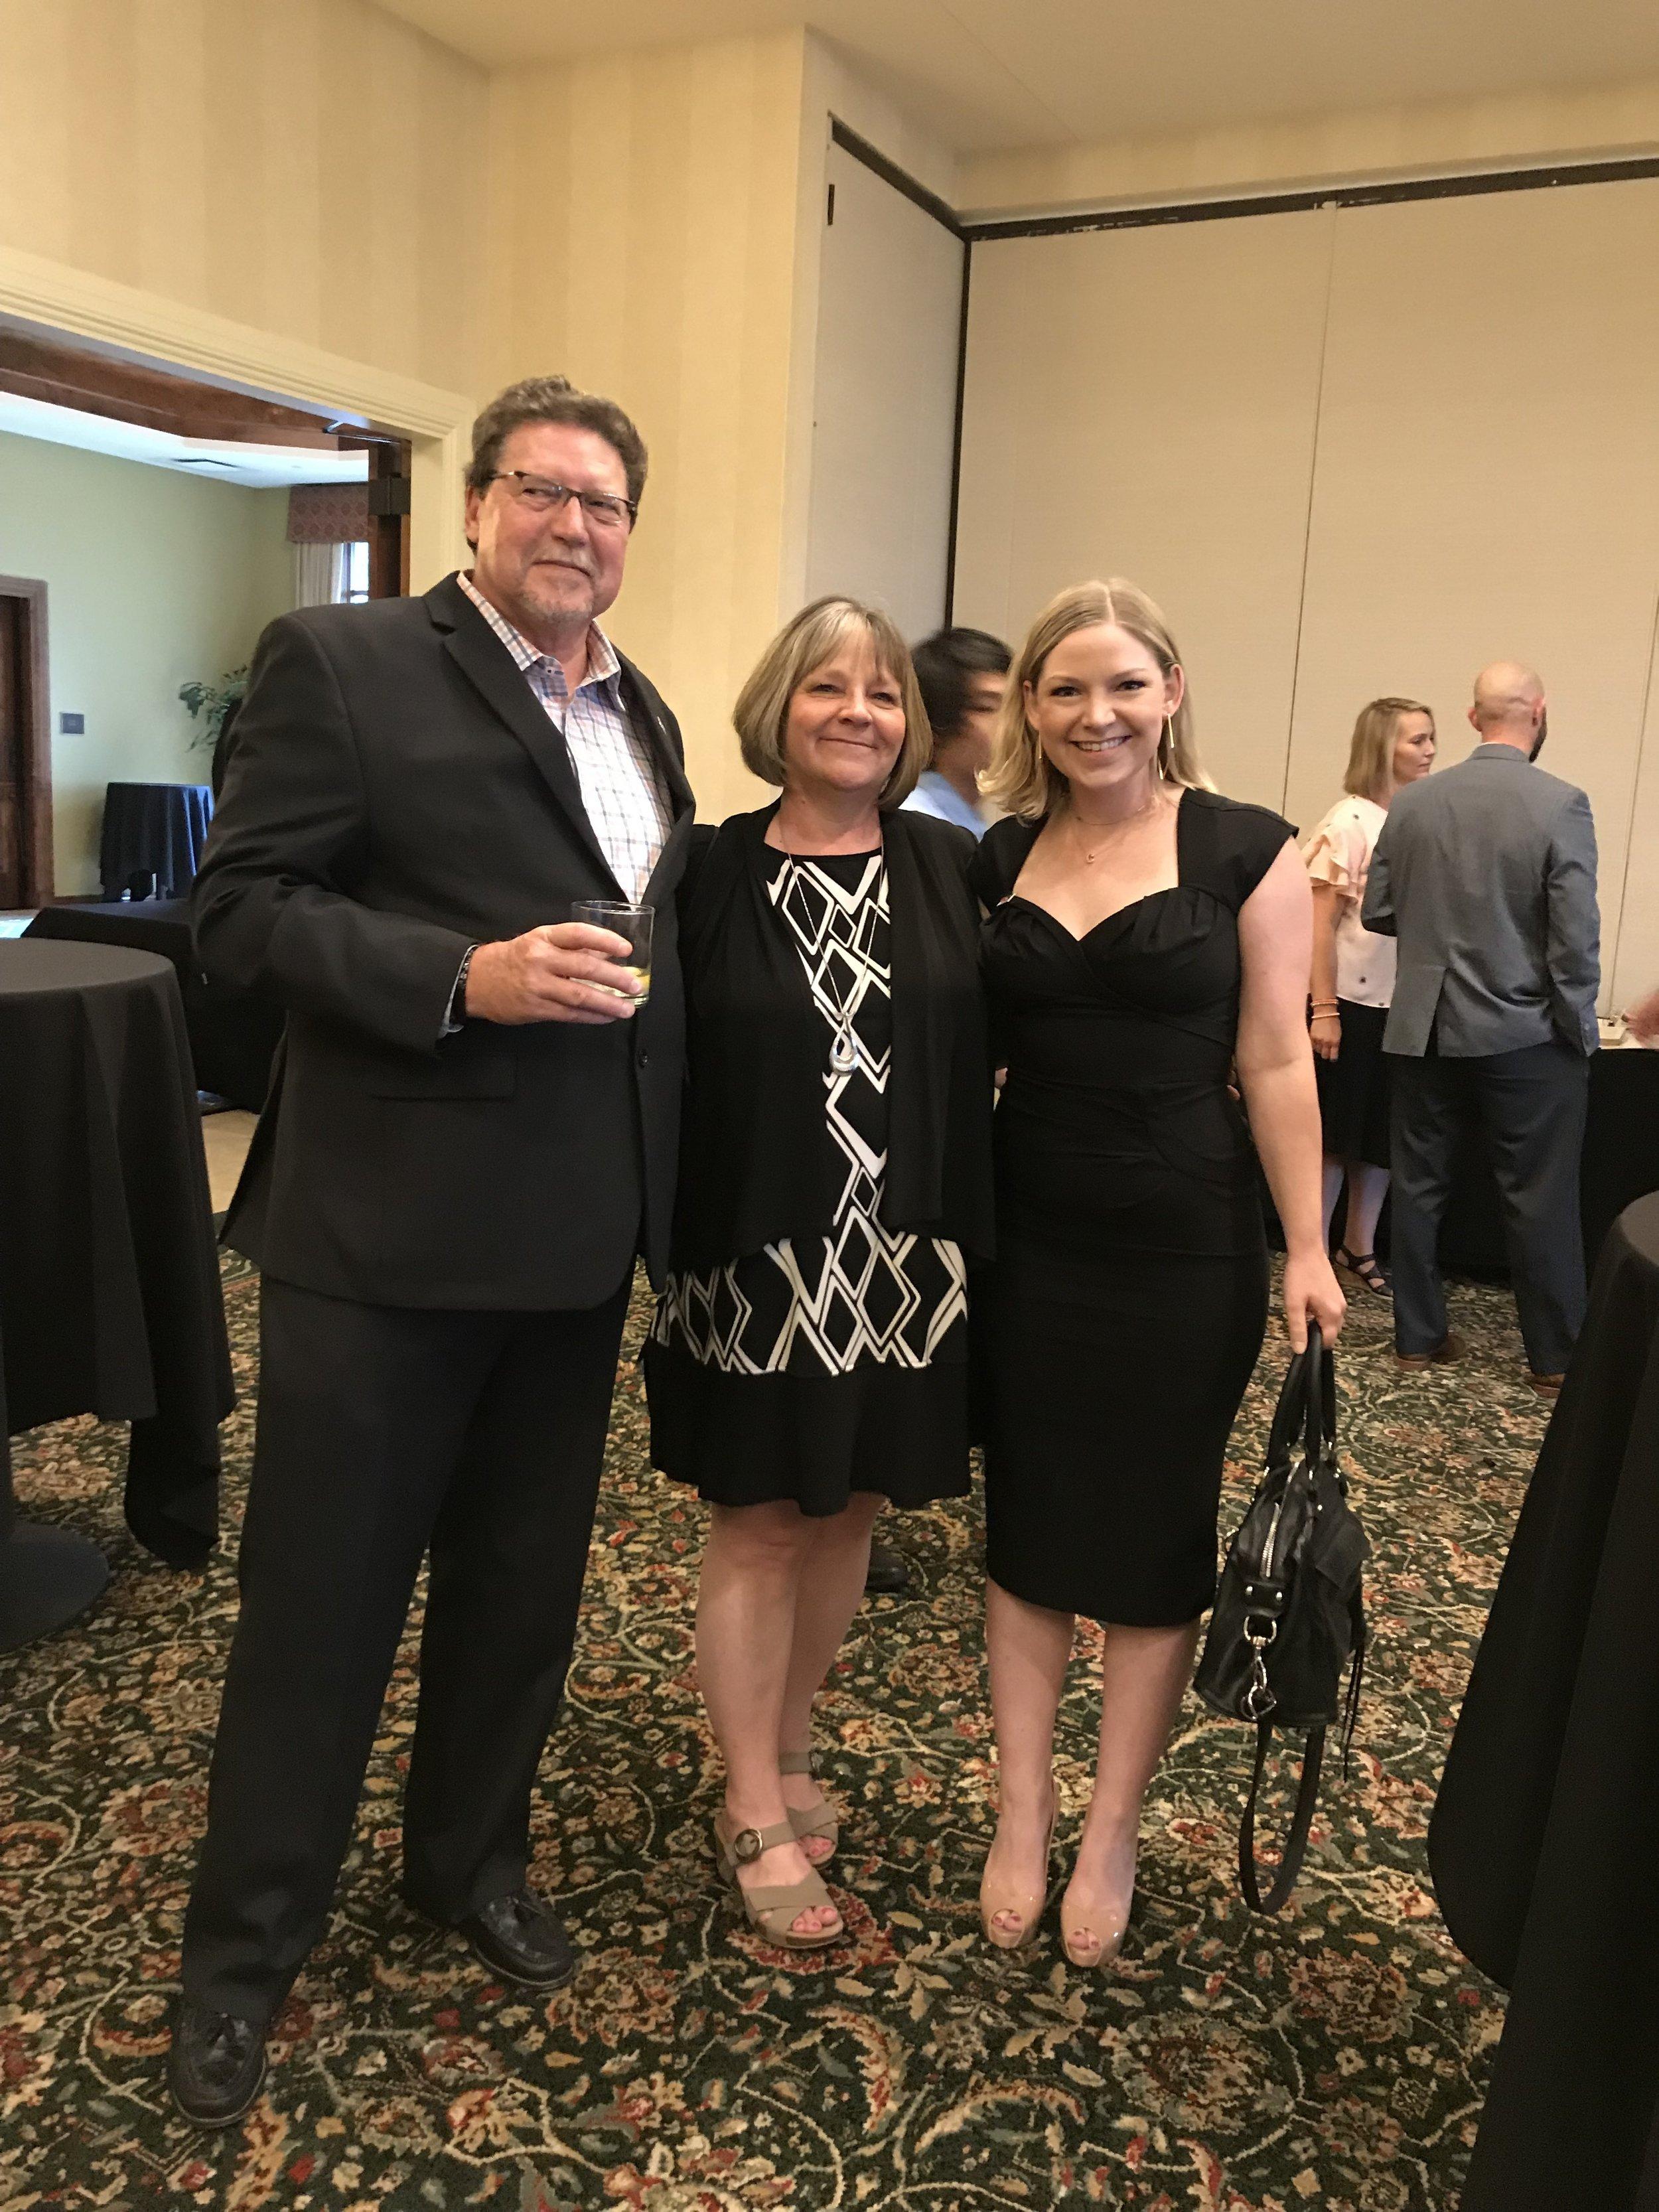 Steve, Phyllis, and Hannah Kane